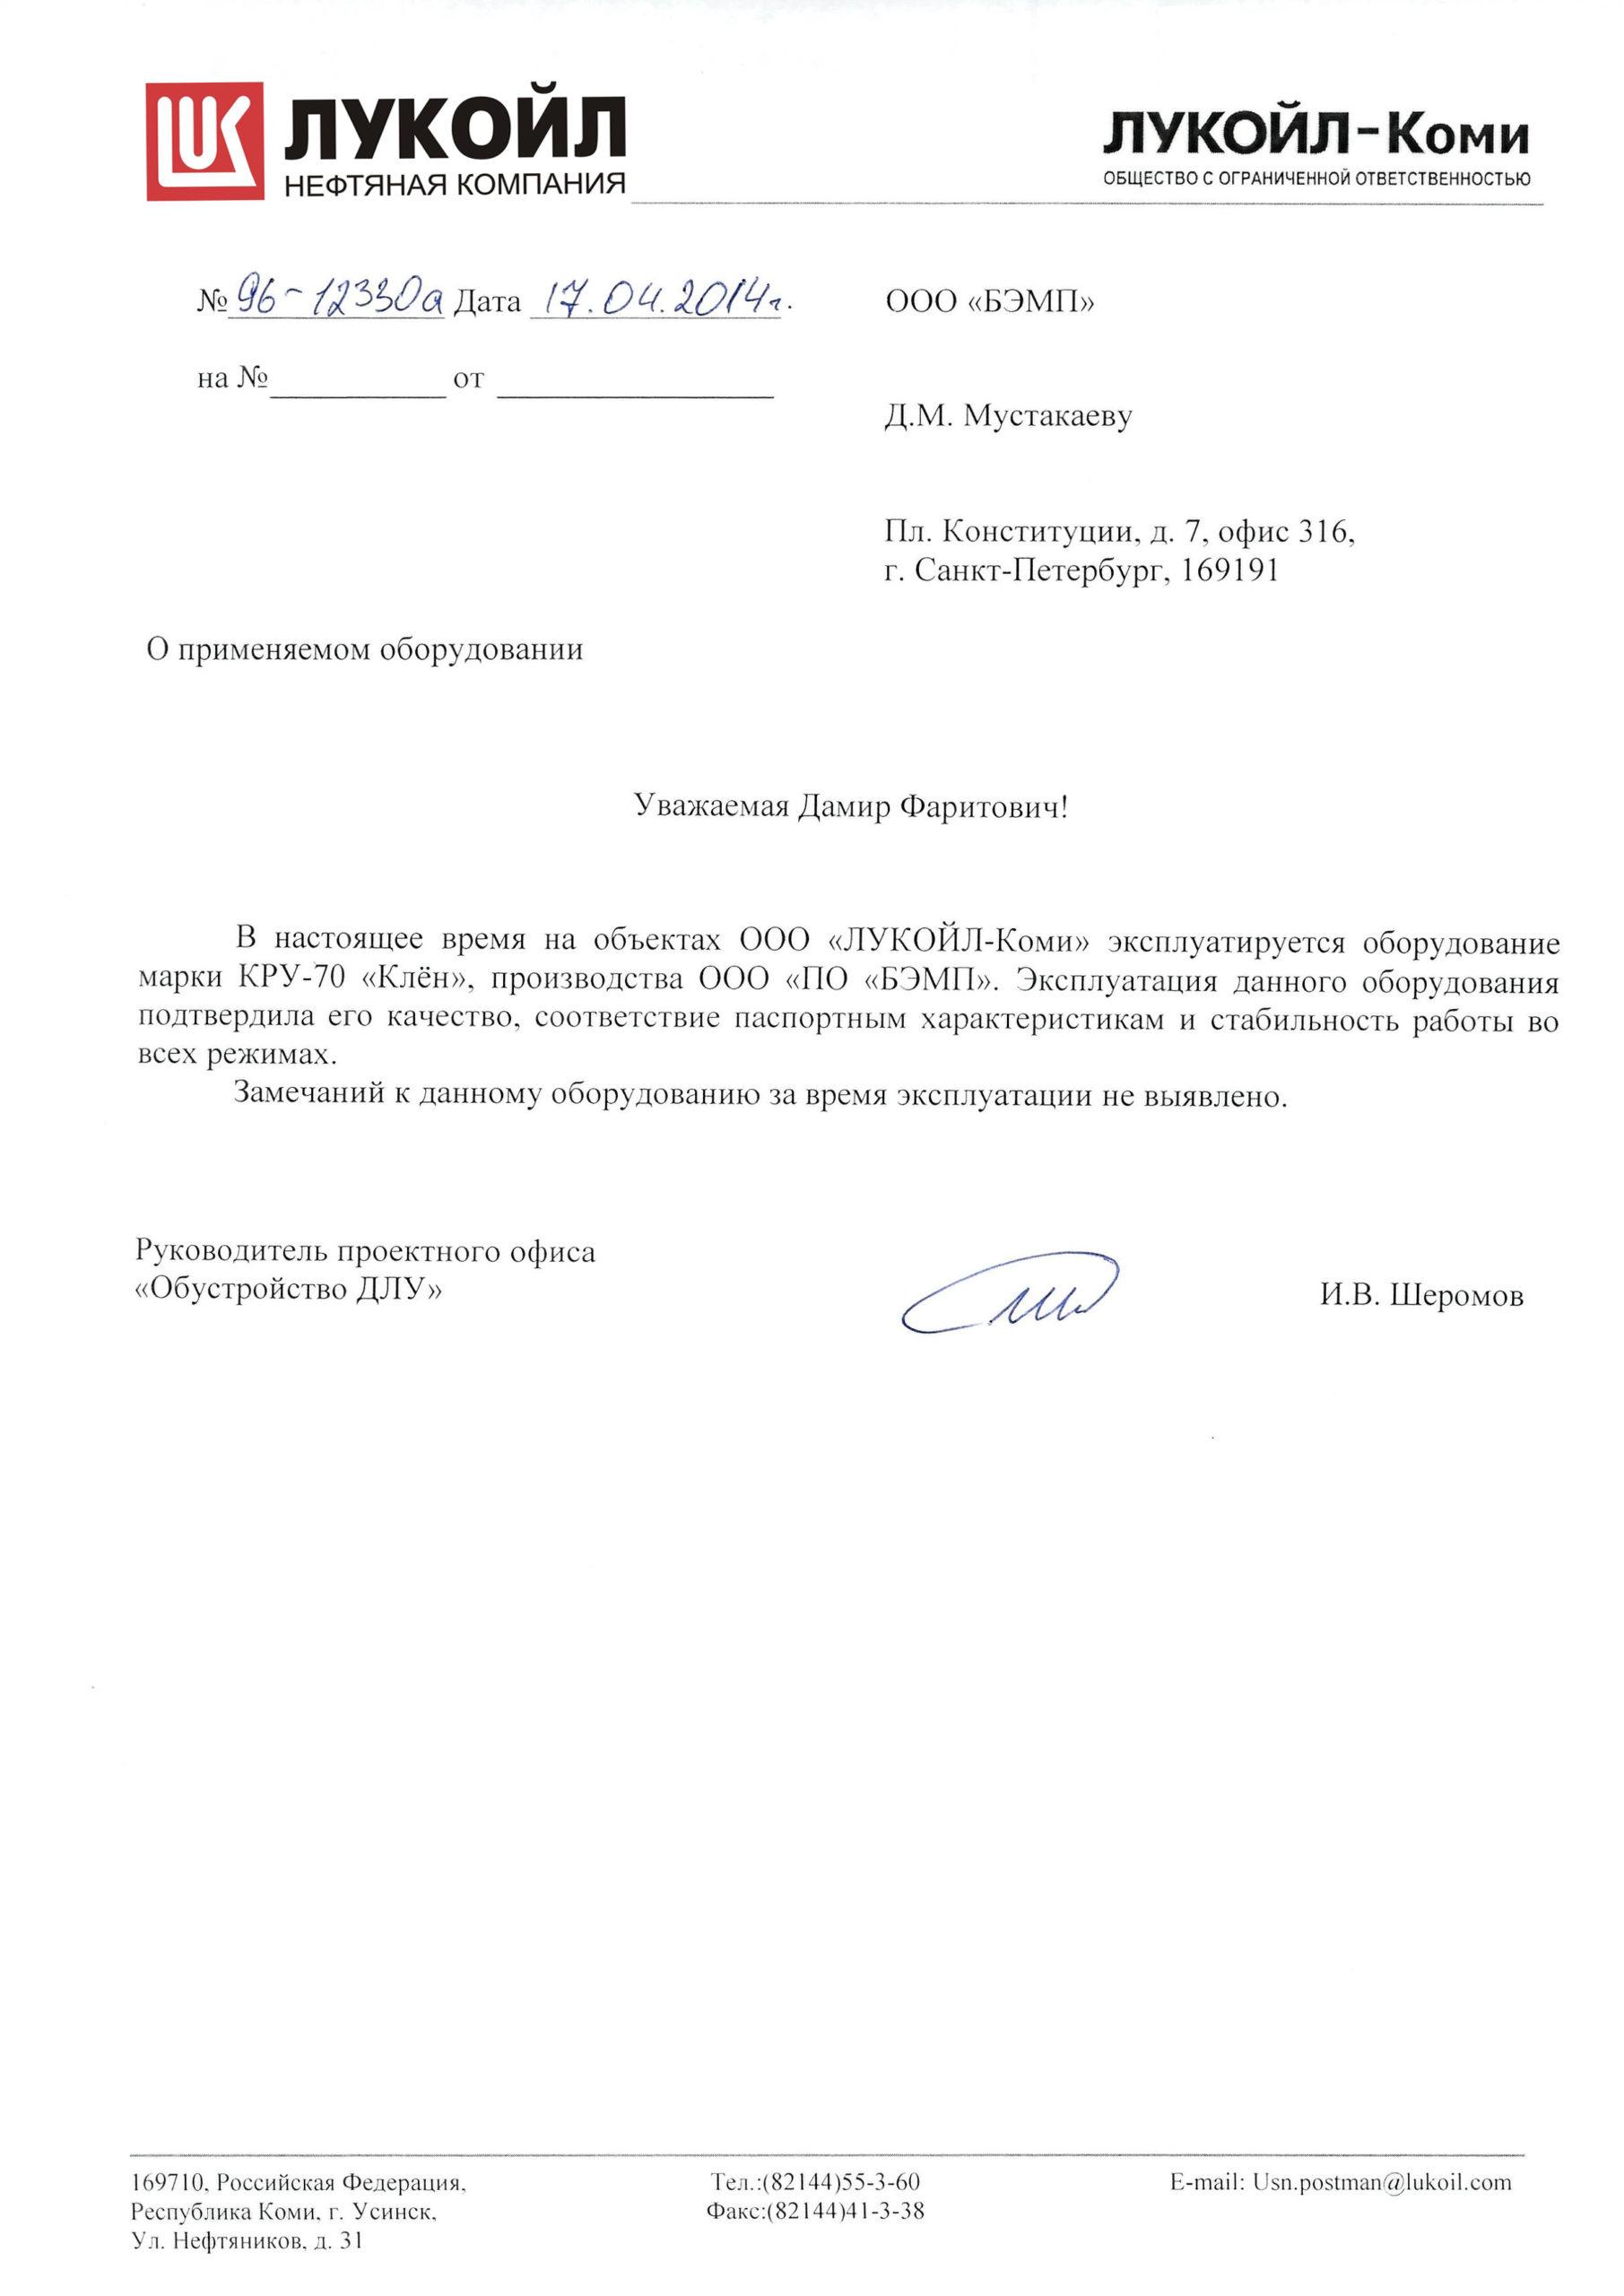 Лукойл-Коми г. Усинск 196_file3 lukoil-komi-196_file3